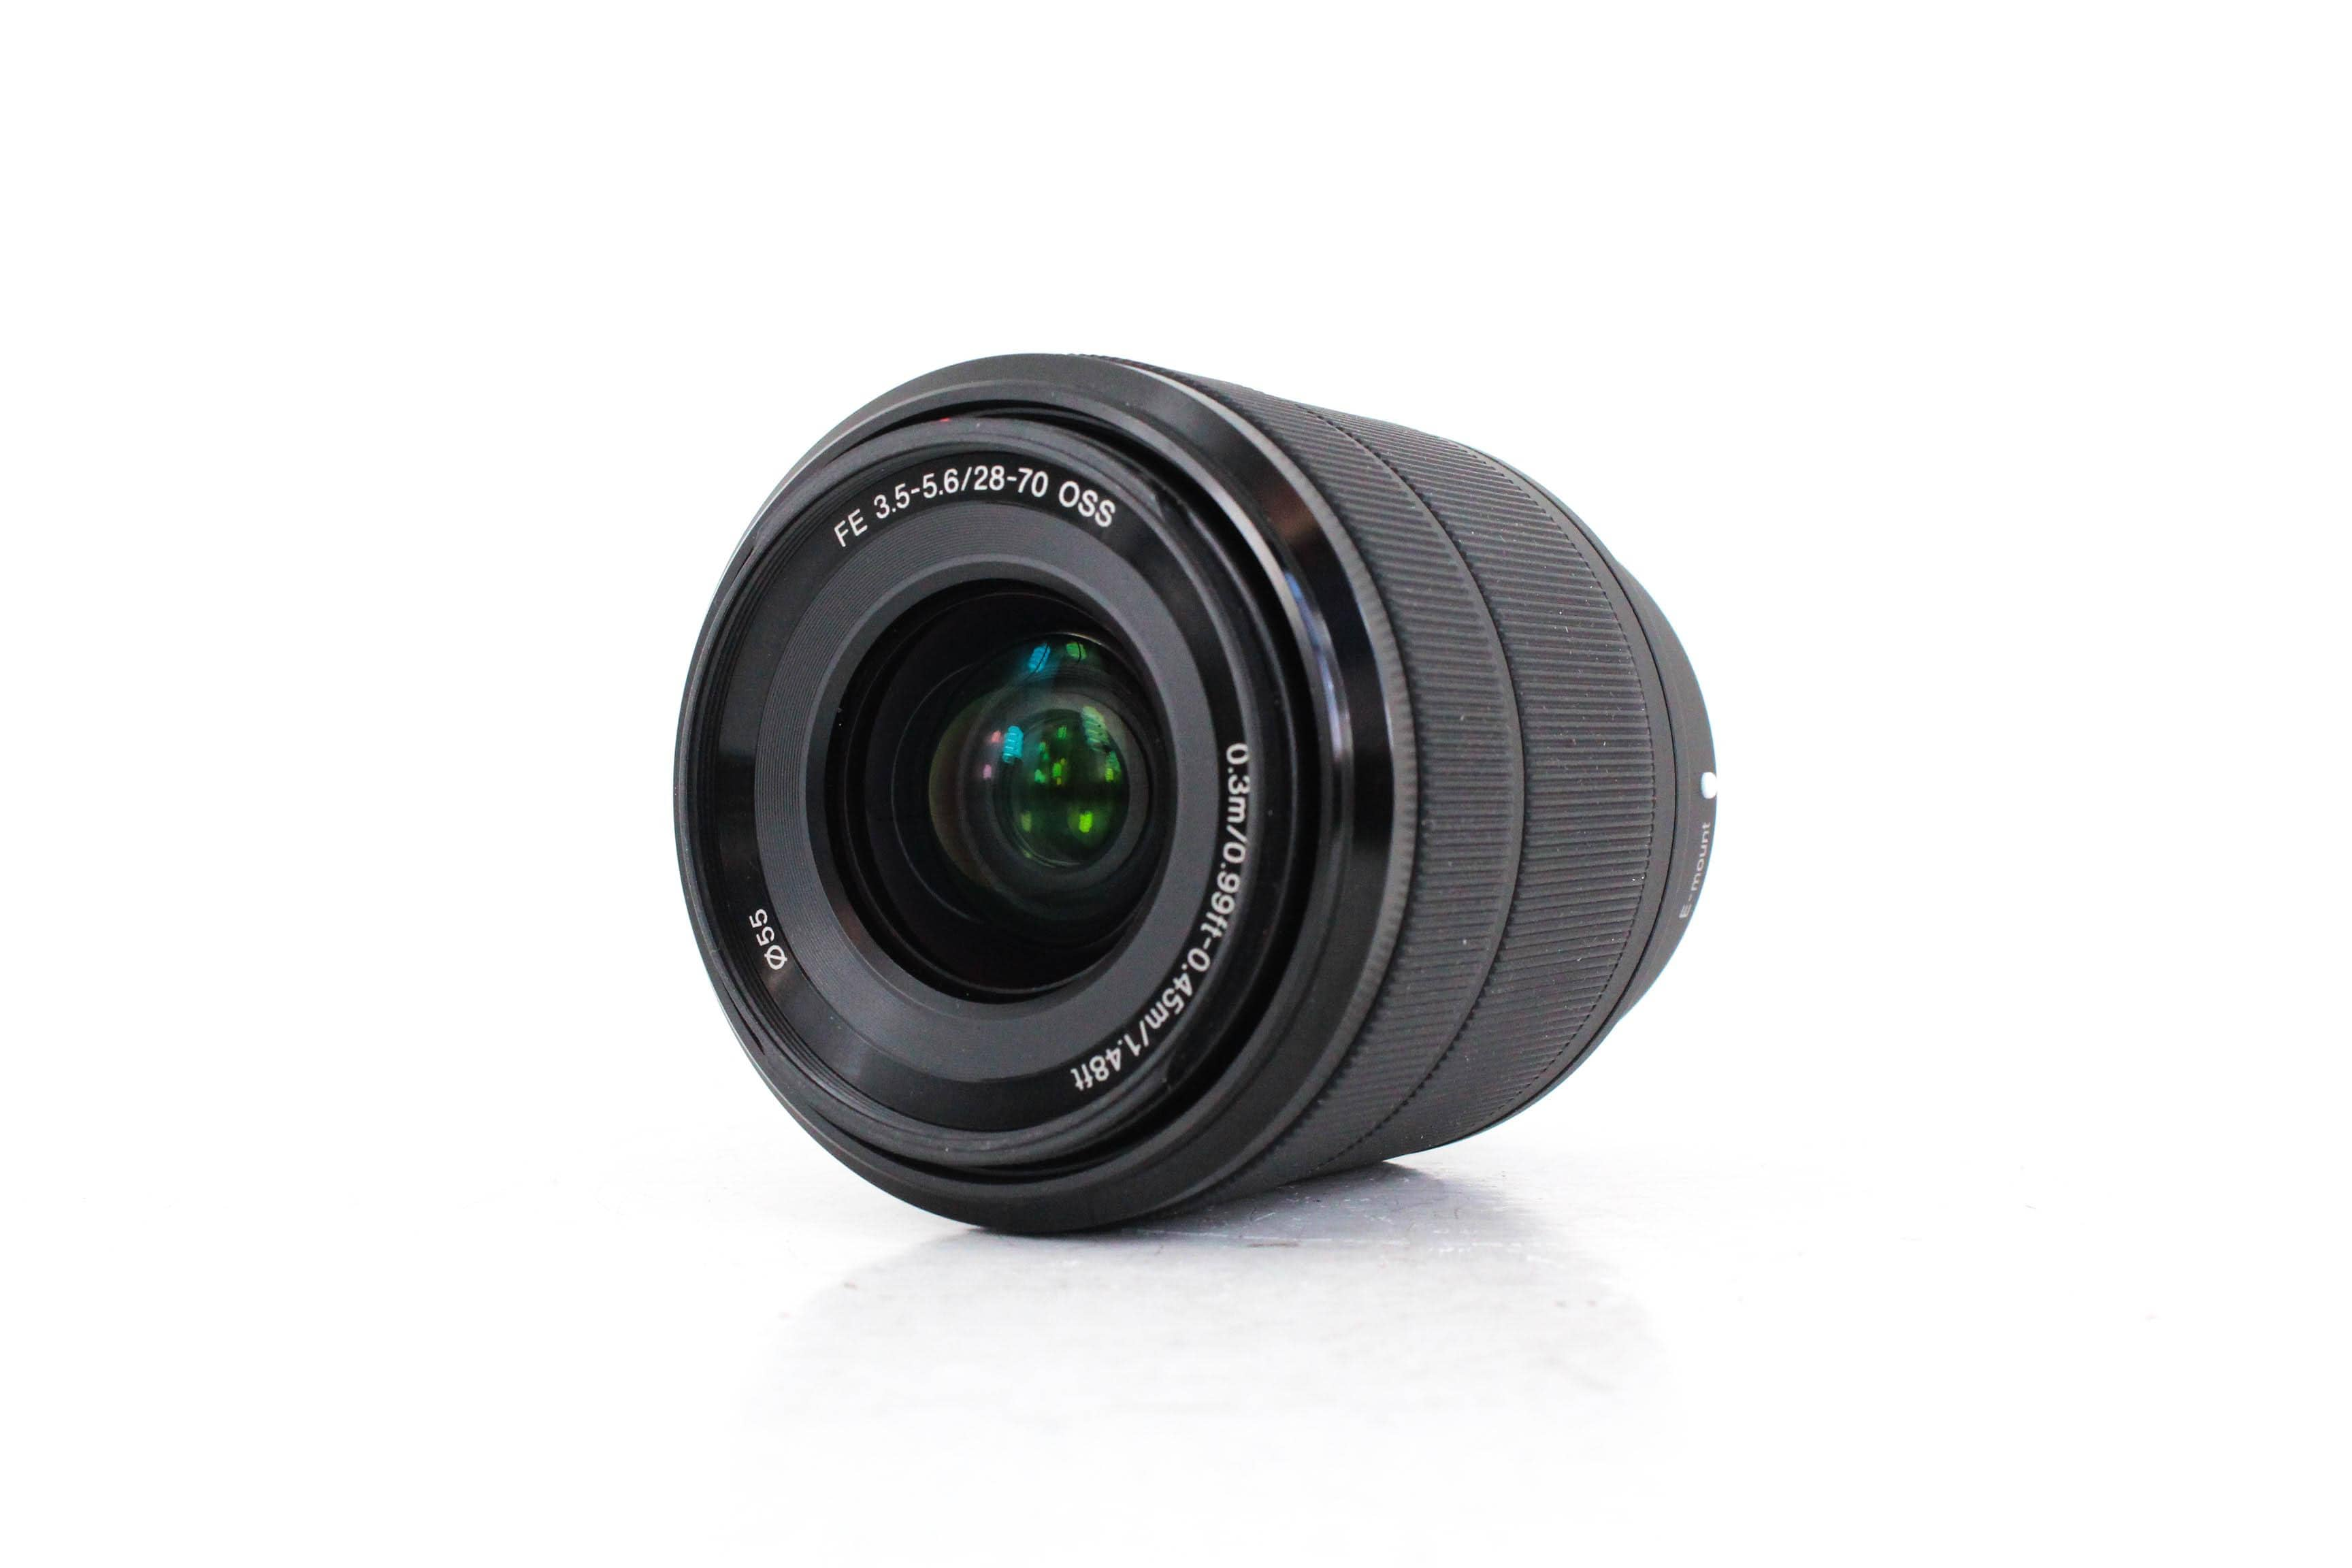 sony28 70mm min image